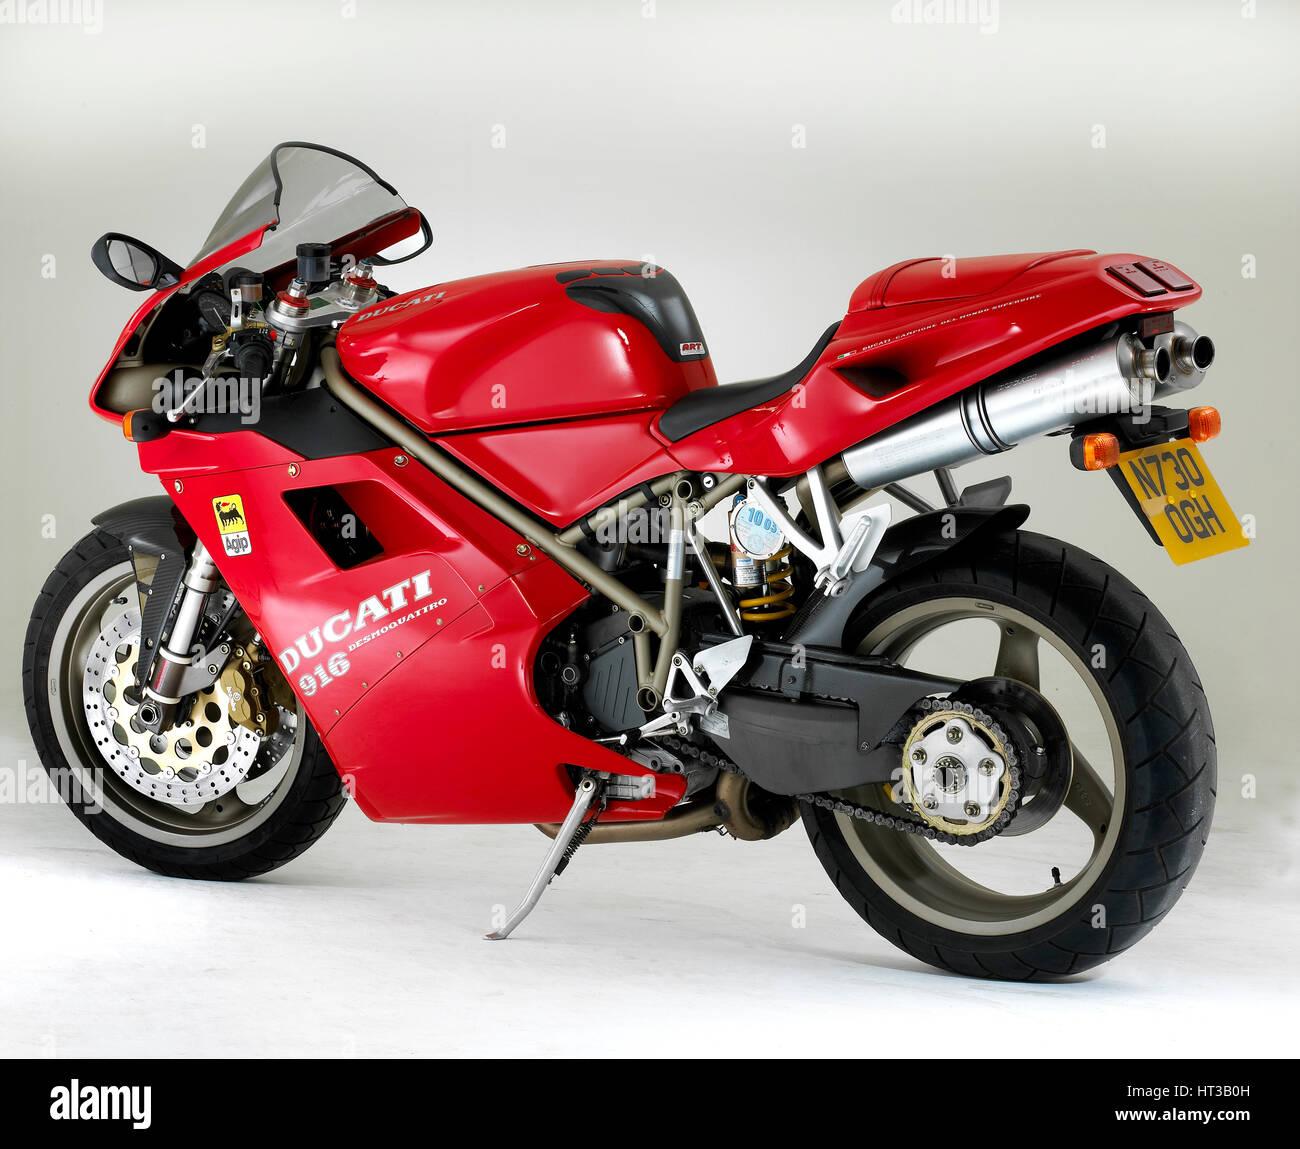 1995 Ducati 916. Artist: Unknown. - Stock Image